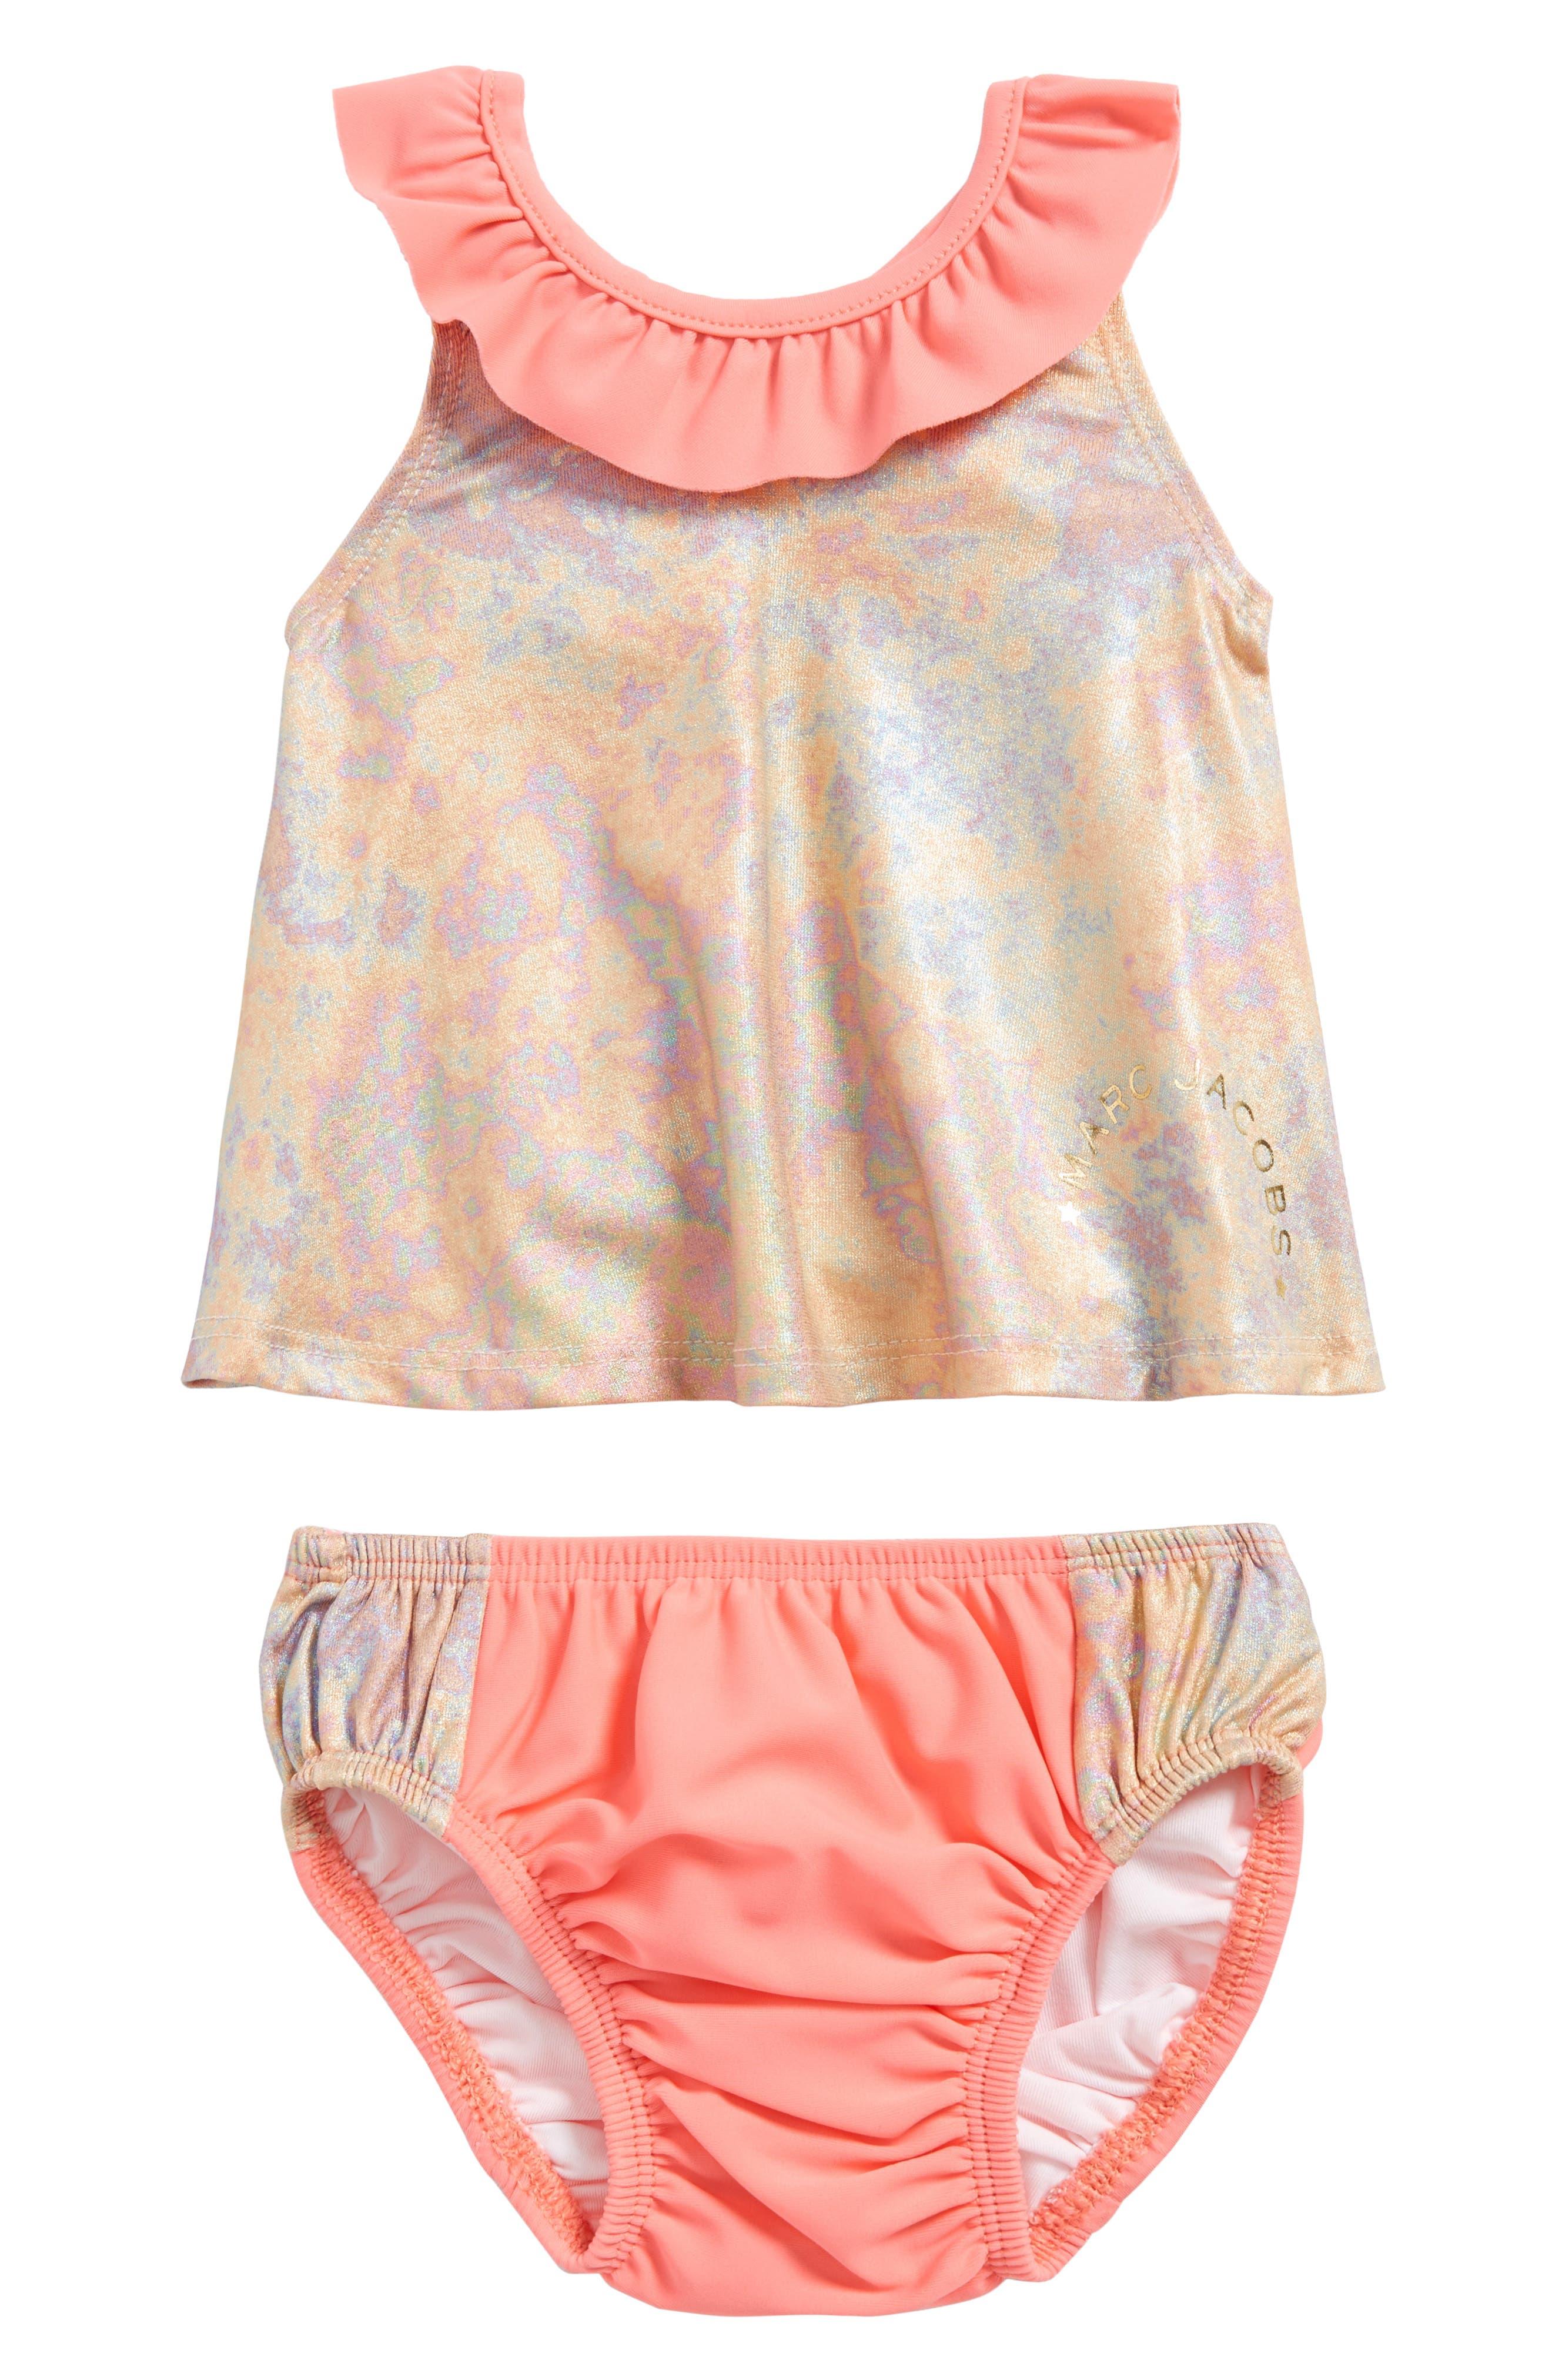 Irisescent Two-Piece Swimsuit,                             Main thumbnail 1, color,                             660